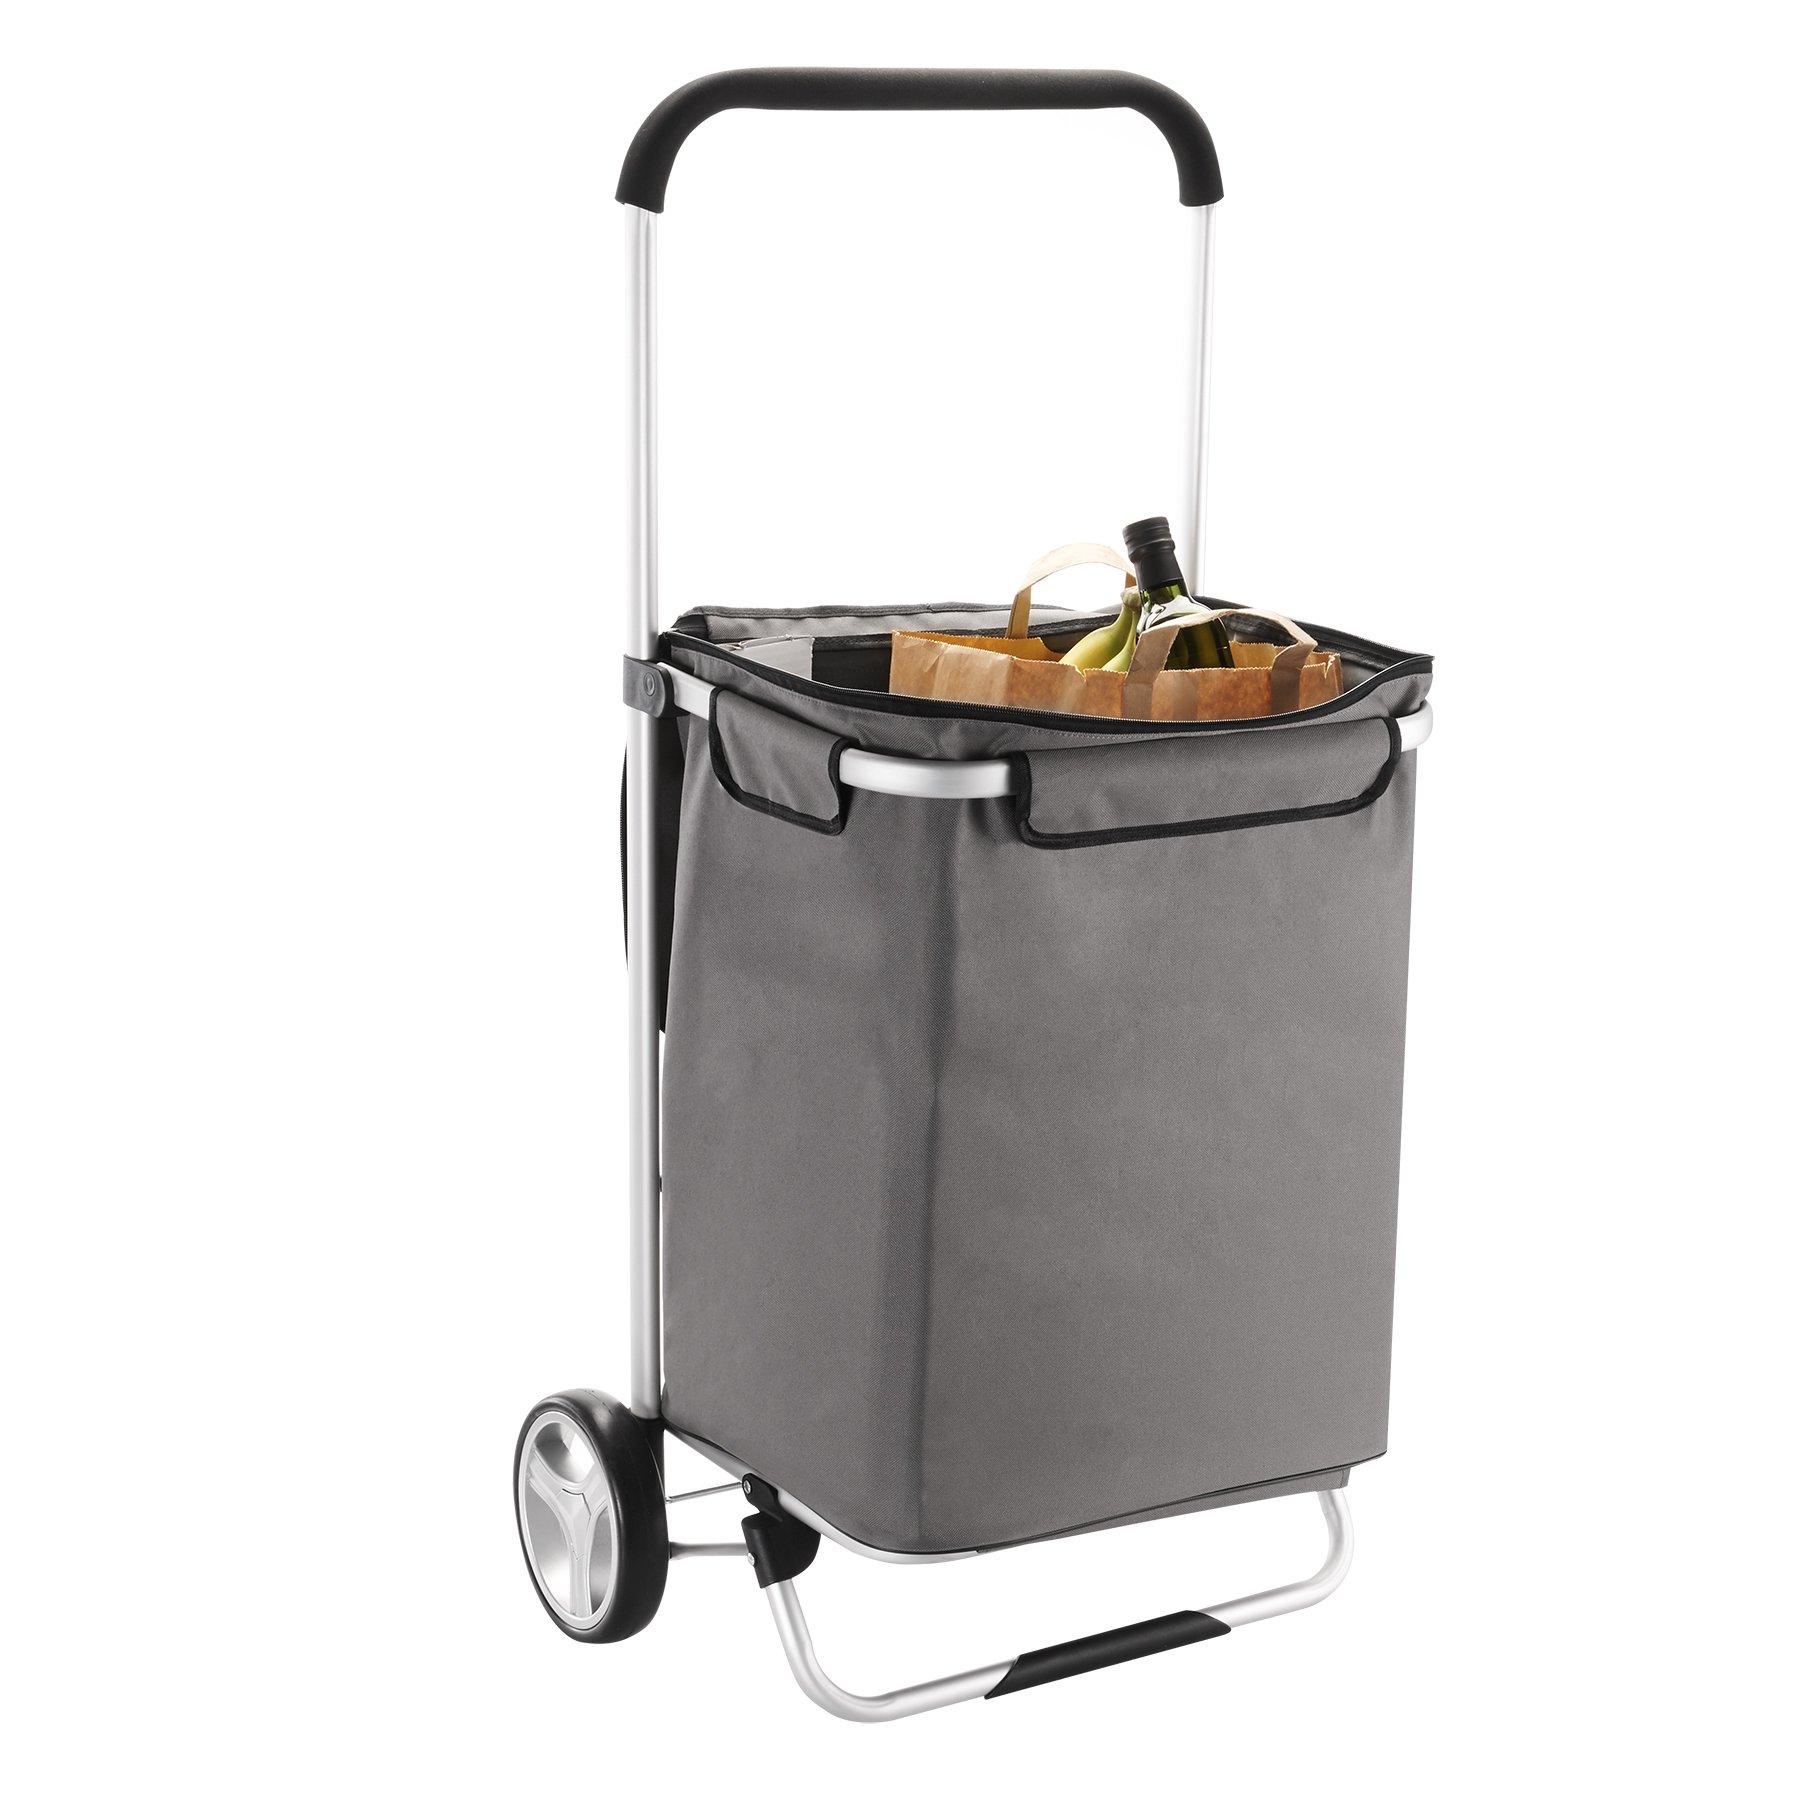 Homz Large Euro Tote Shopping Cart,